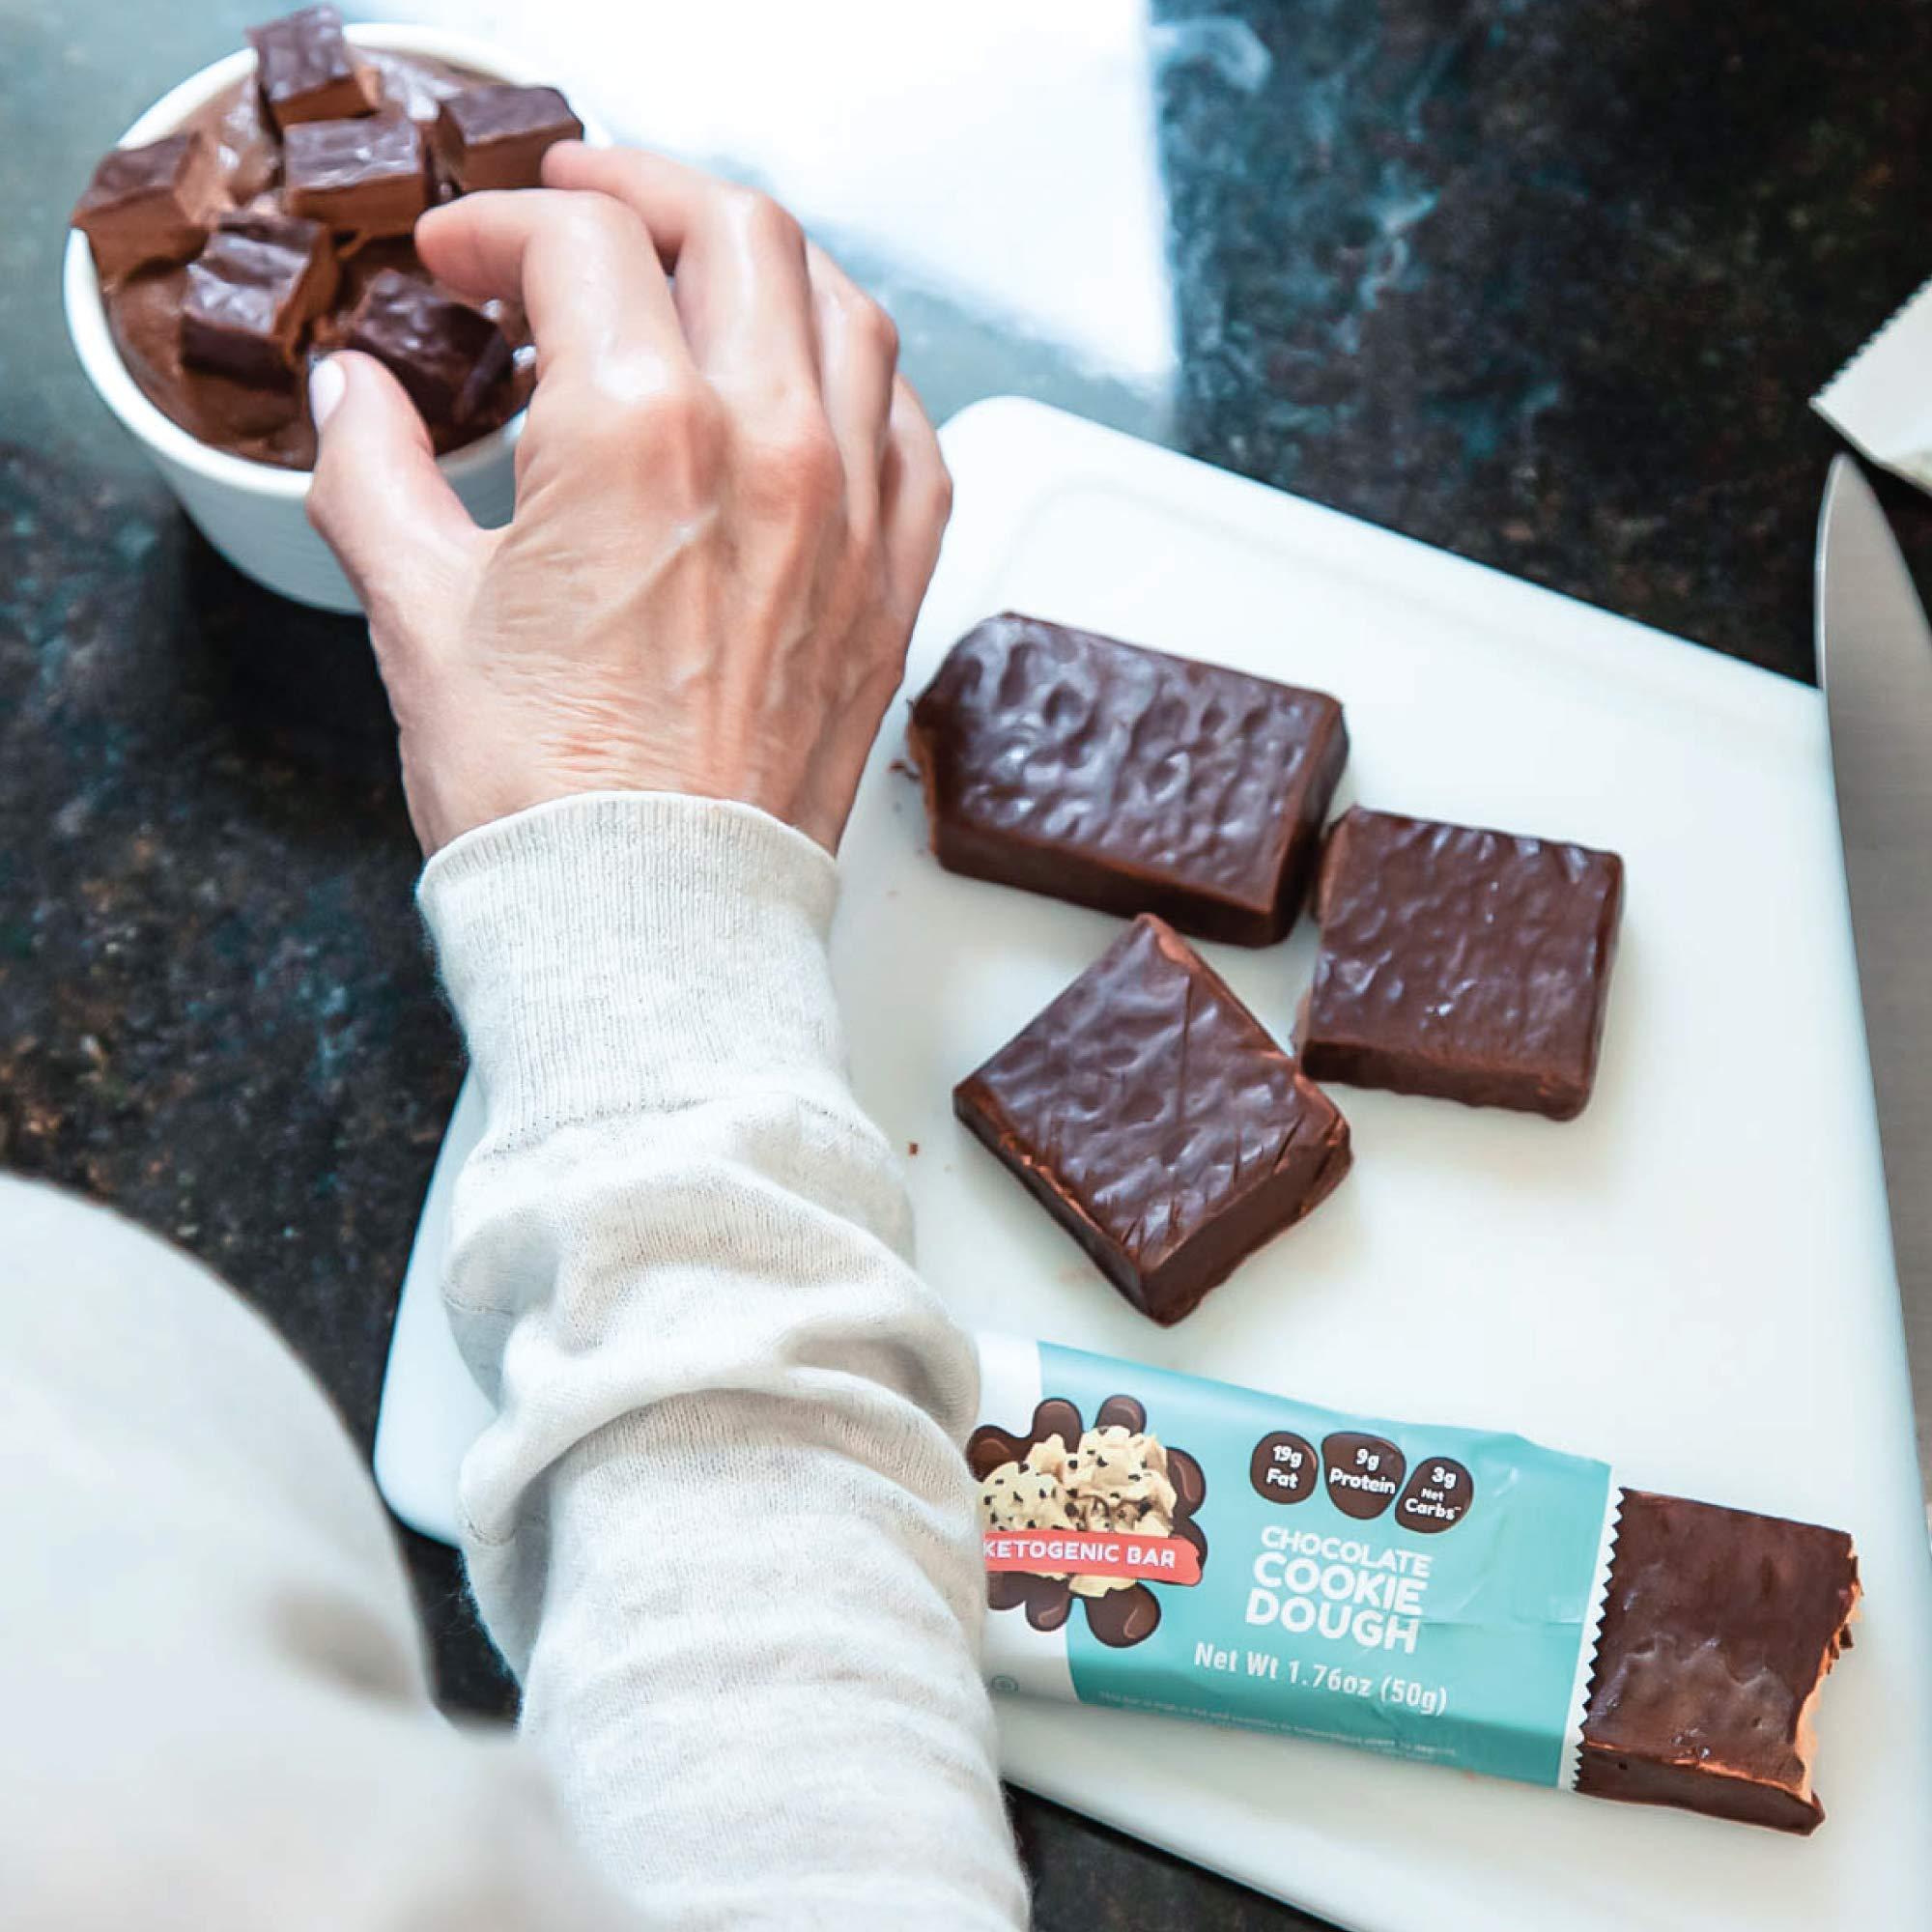 Kiss My Keto Snacks Keto Bars - Keto Chocolate Cookie Dough (3 Pack, 36 Bars), Nutritional Keto Food Bars, Paleo, Low Carb/Glycemic Keto Friendly Foods, All Natural On-The-Go Snacks, 3g Net Carbs by Kiss My Keto (Image #6)